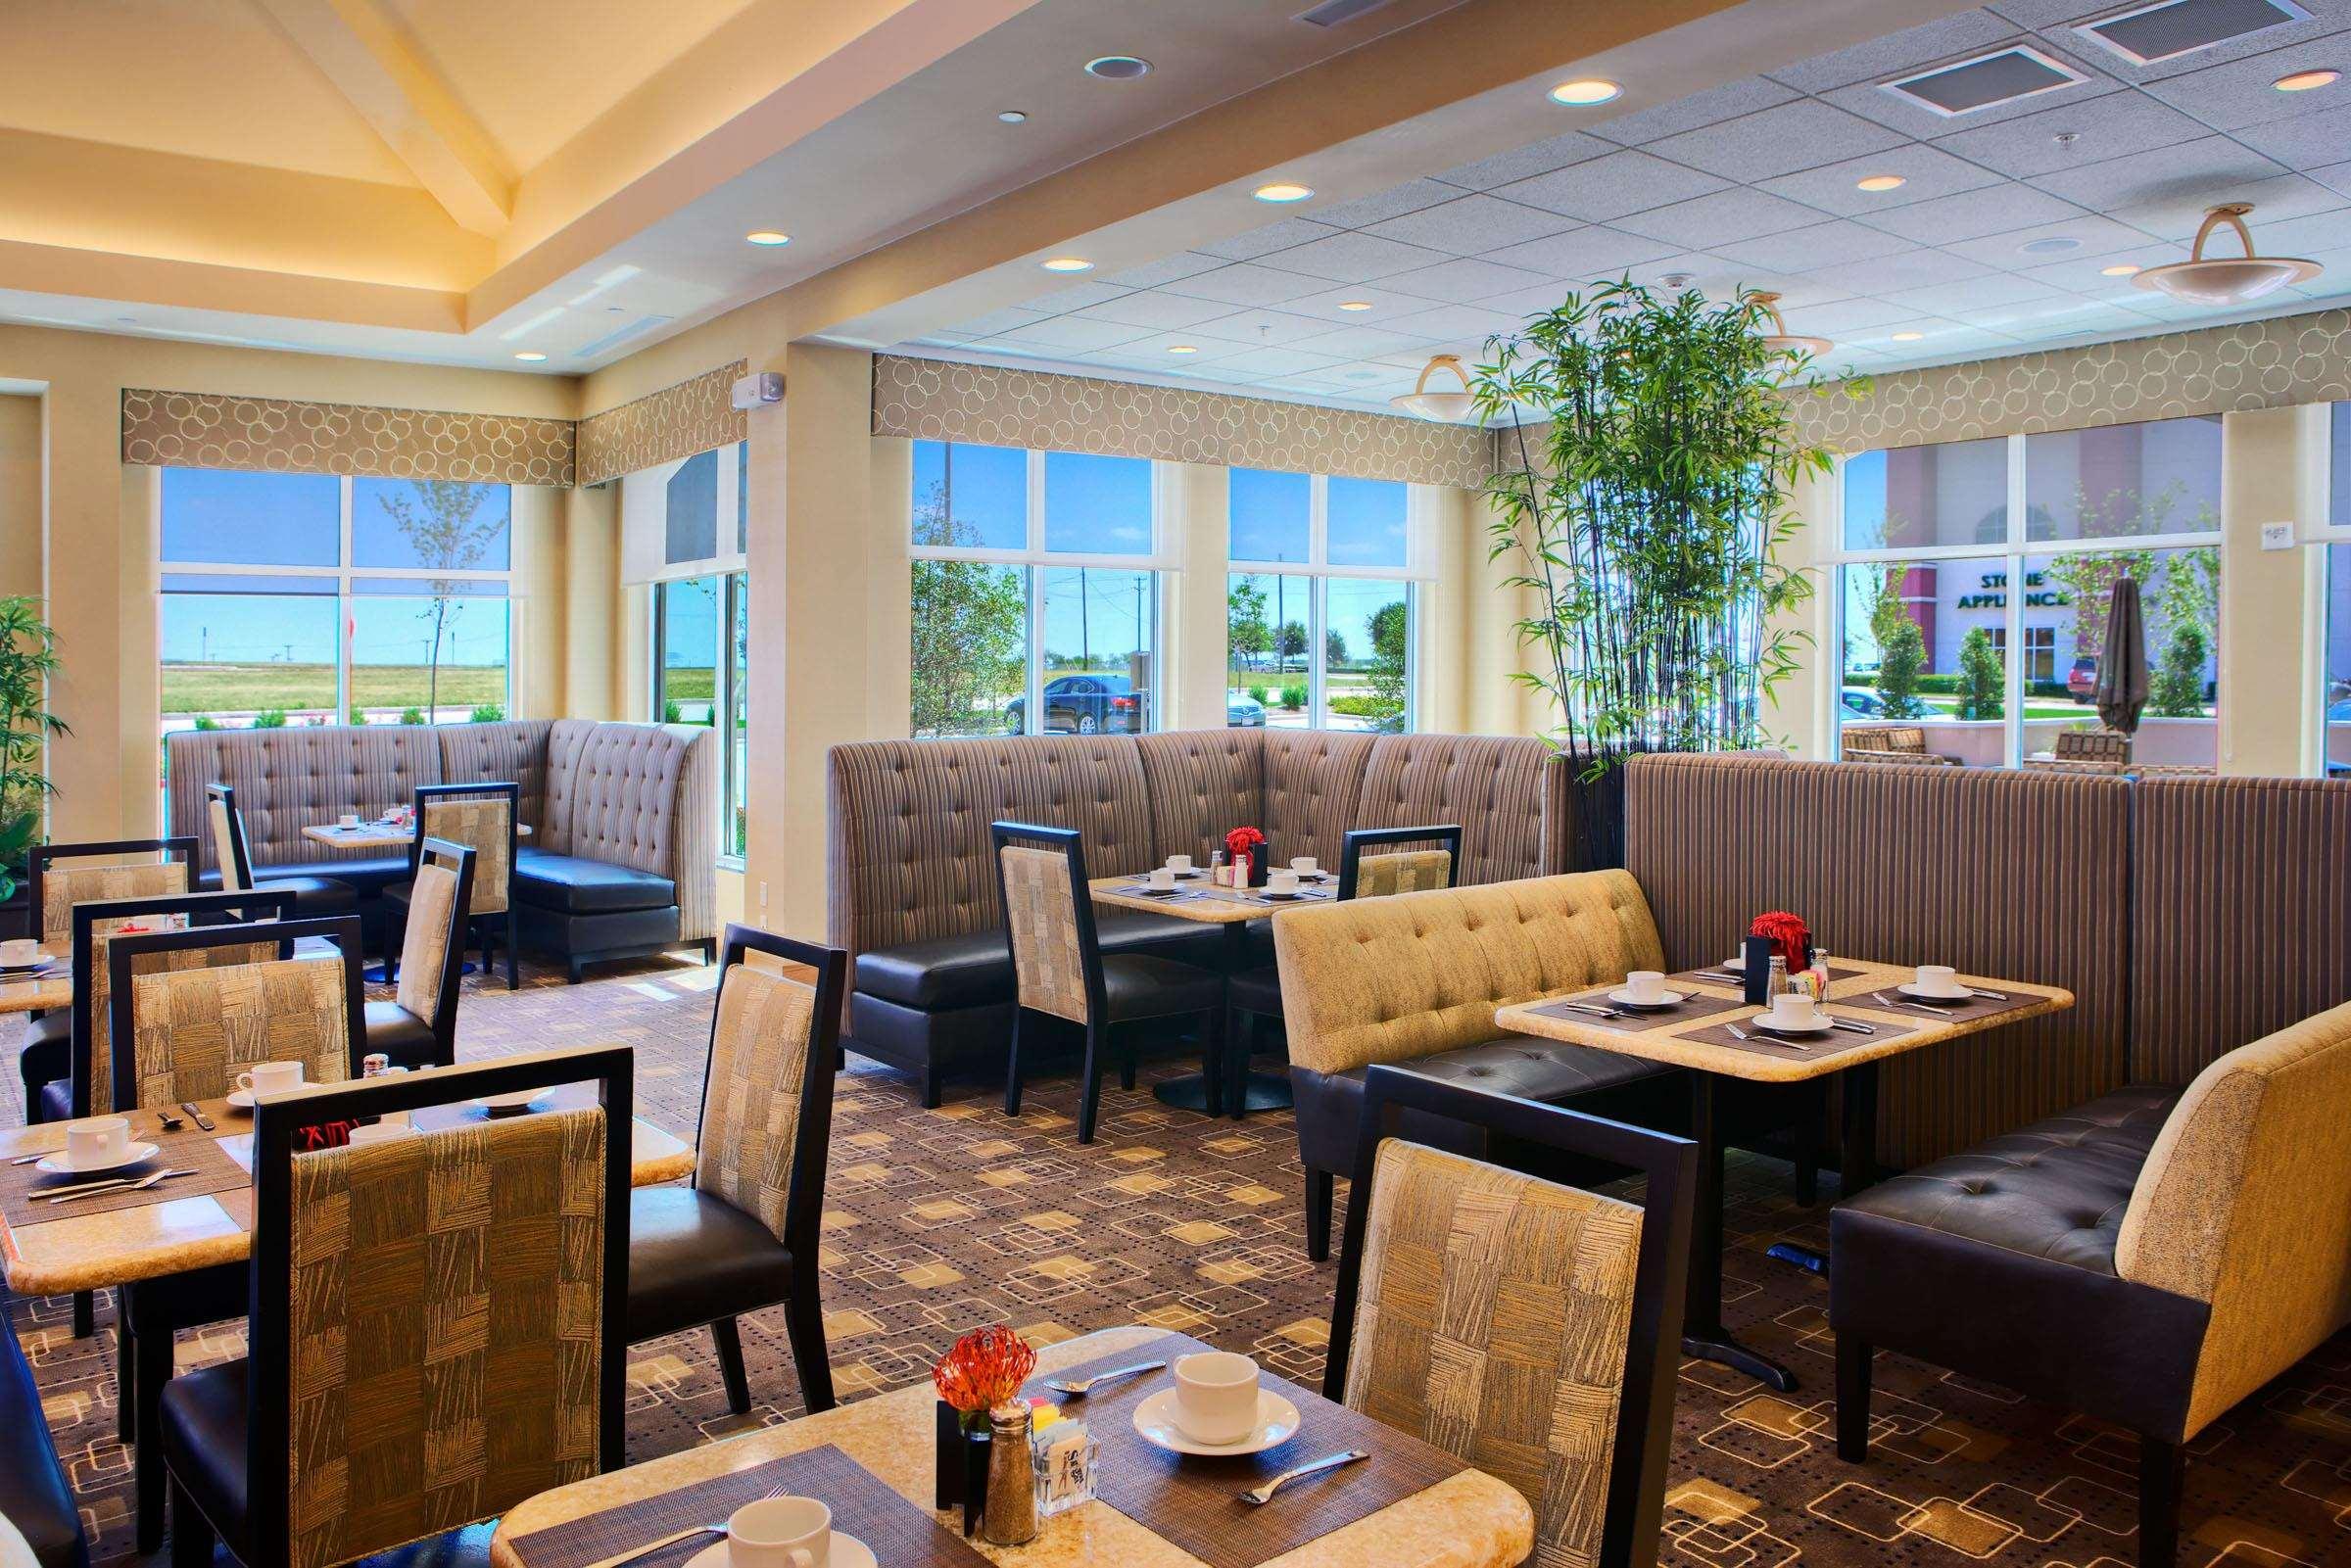 Hilton Garden Inn DFW North Grapevine image 15